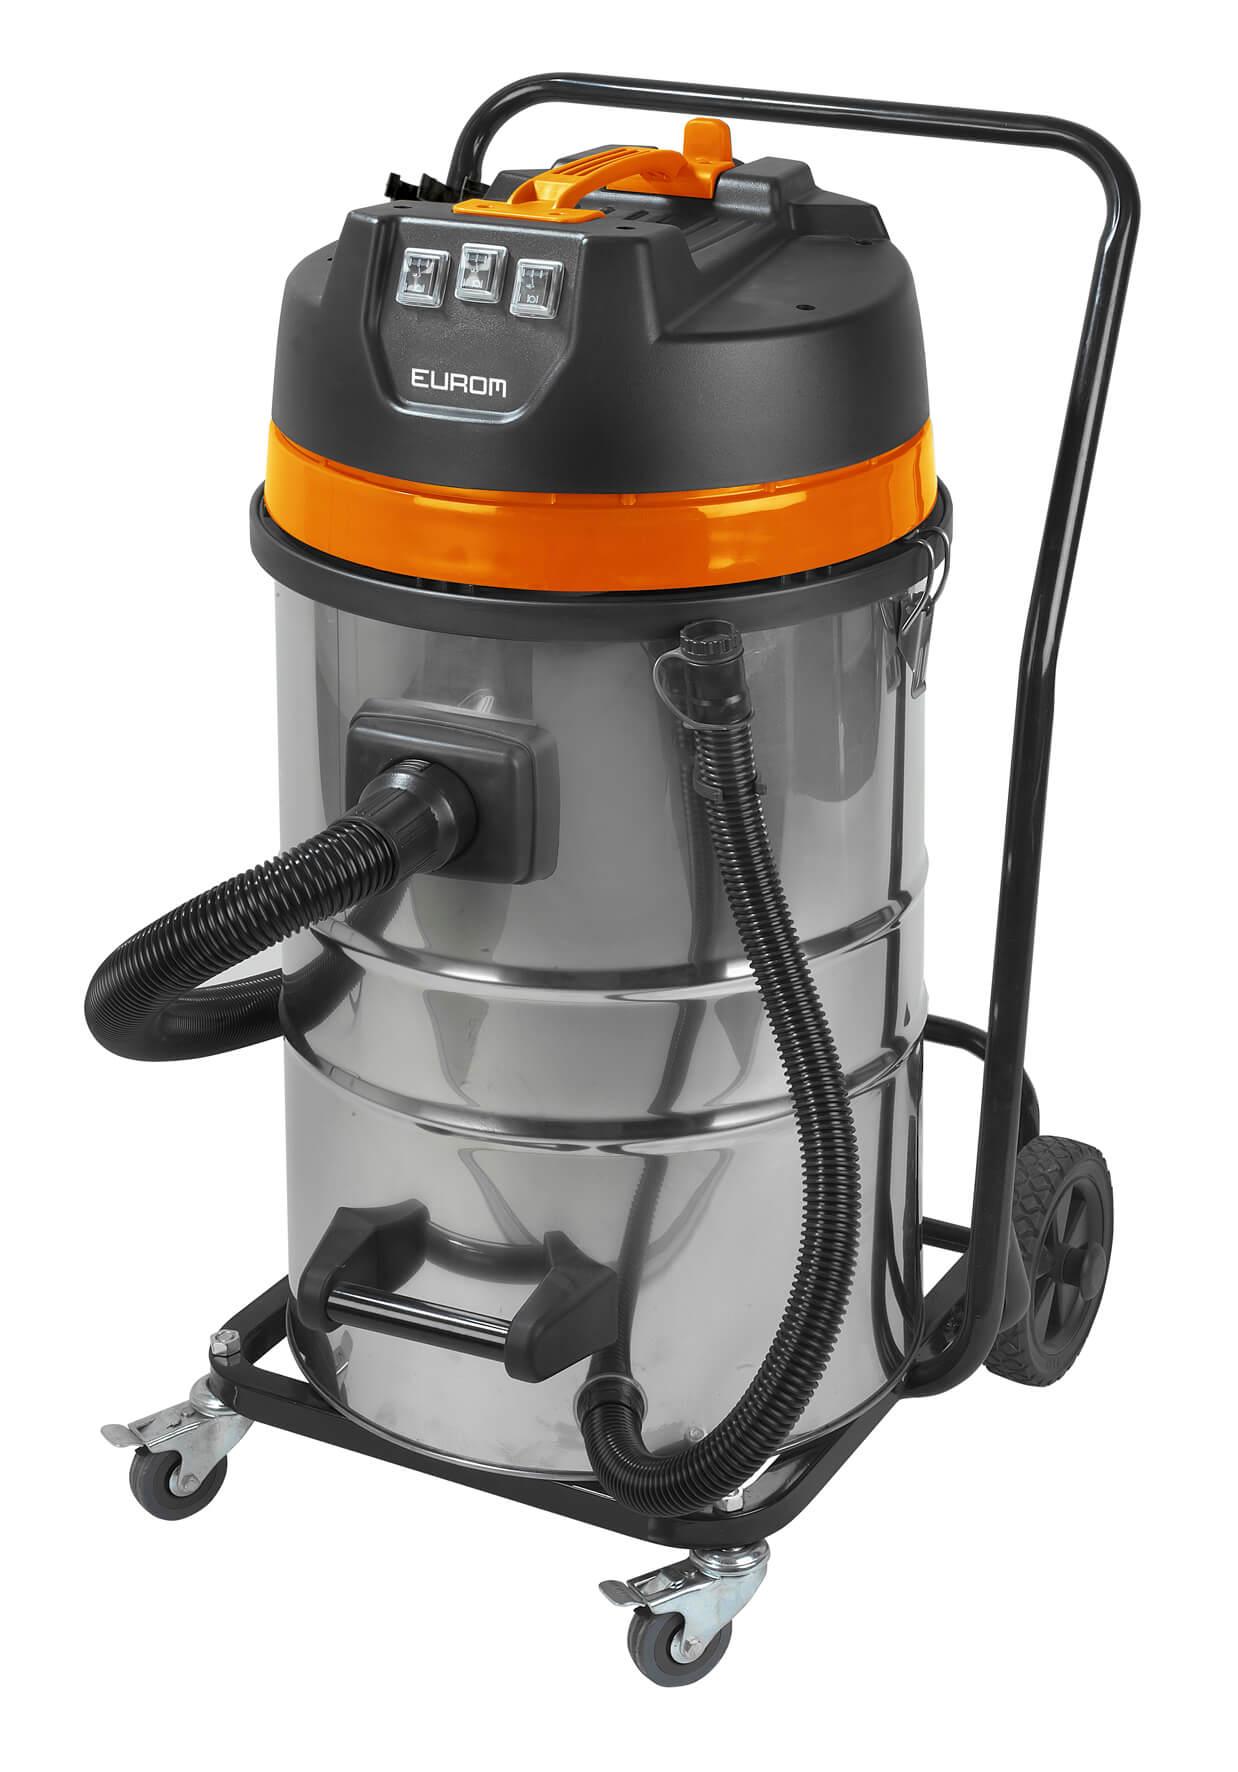 Eurom Force 3080 Alleszuiger 3000W | Stof en waterzuiger 80 liter ketel semi prof